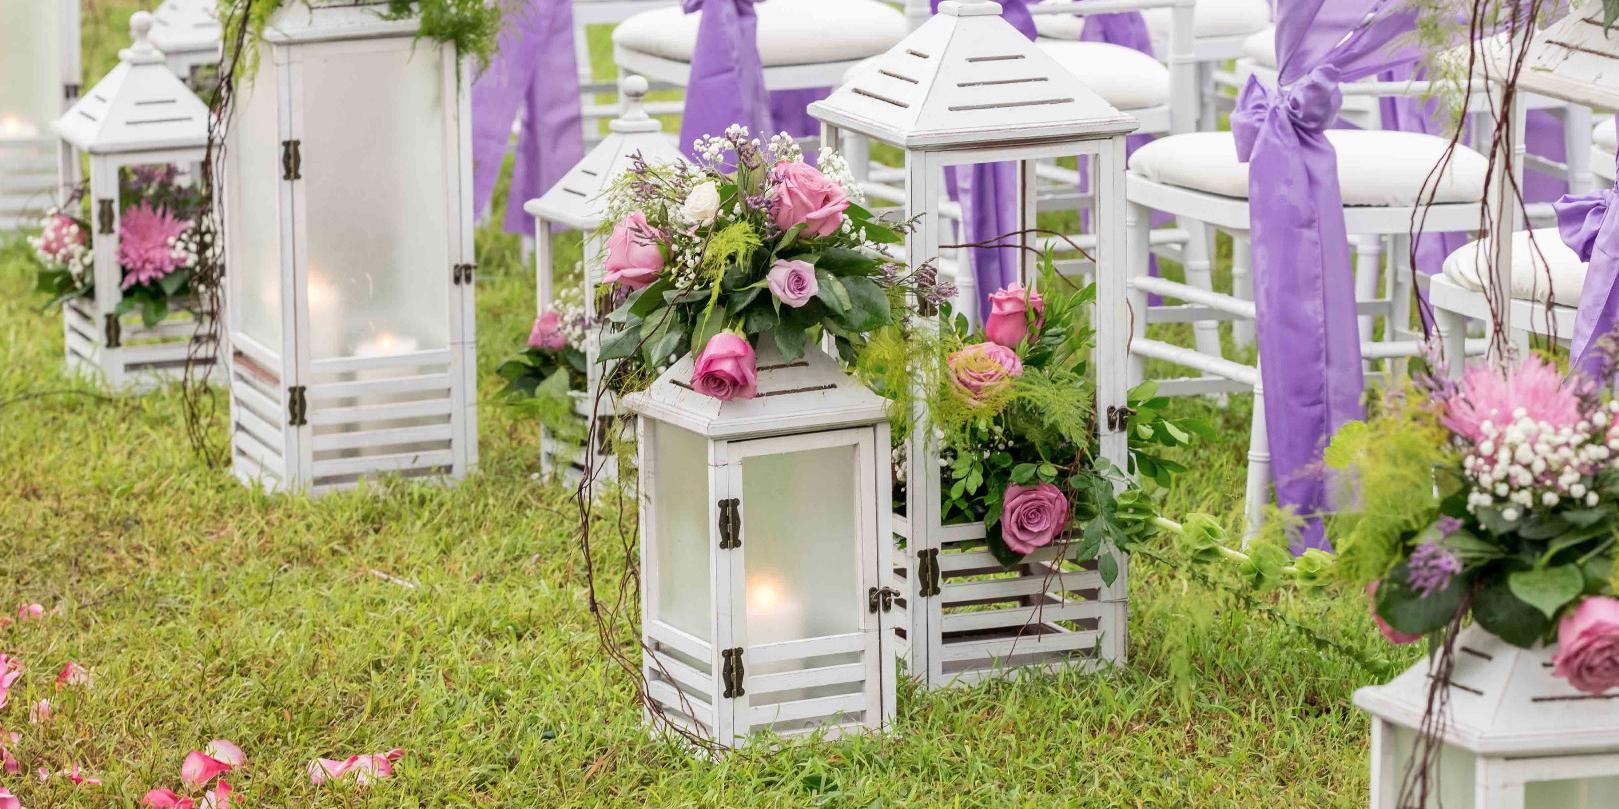 bodas-sin-clasificar-sin-tema-cuba-35731.jpg